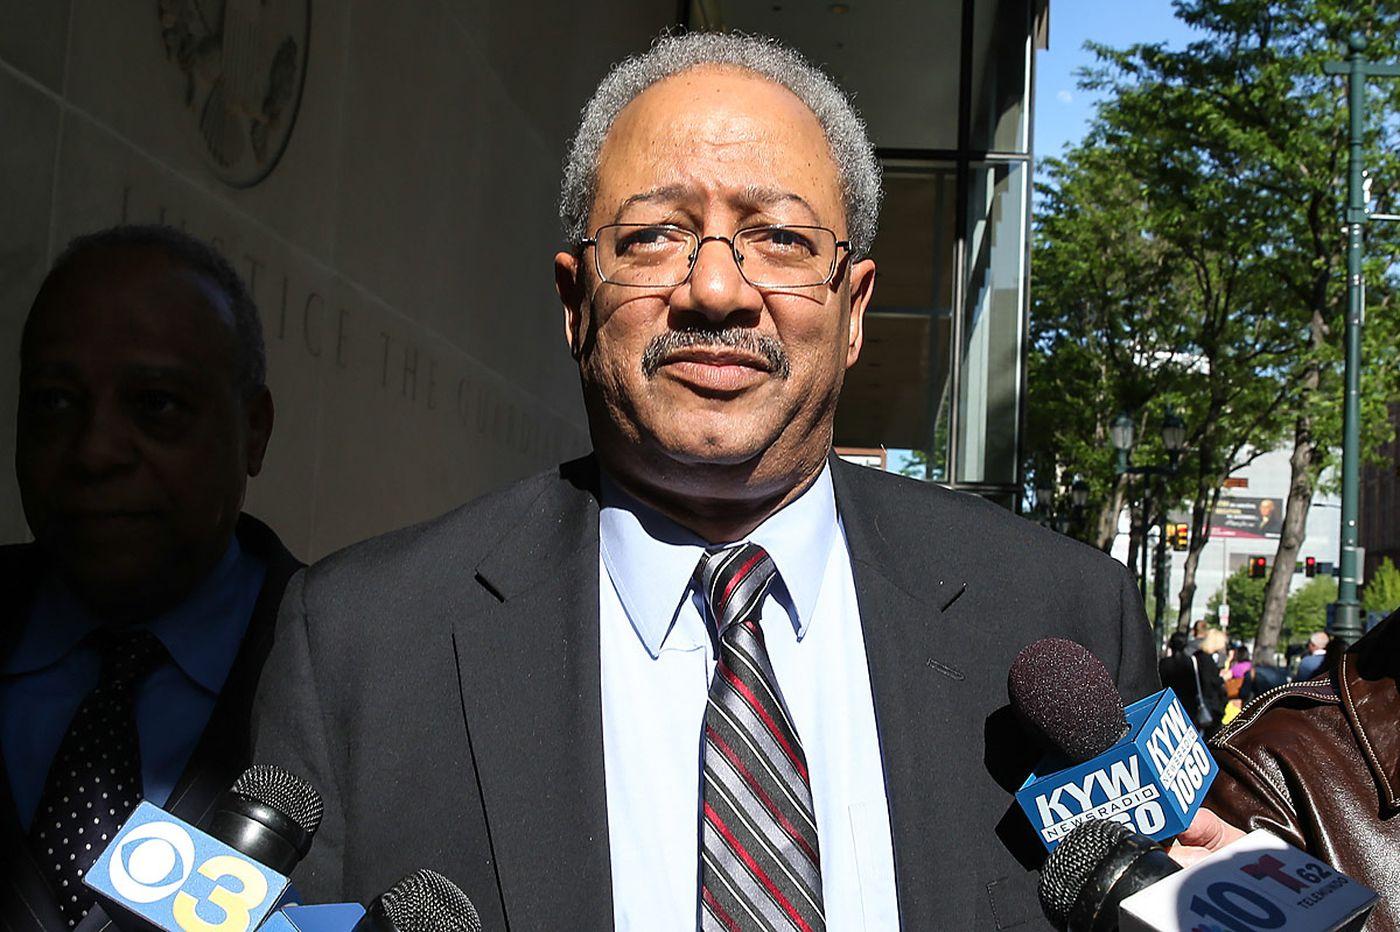 Fattah trial focuses on ex-Sallie Mae CEO's loan